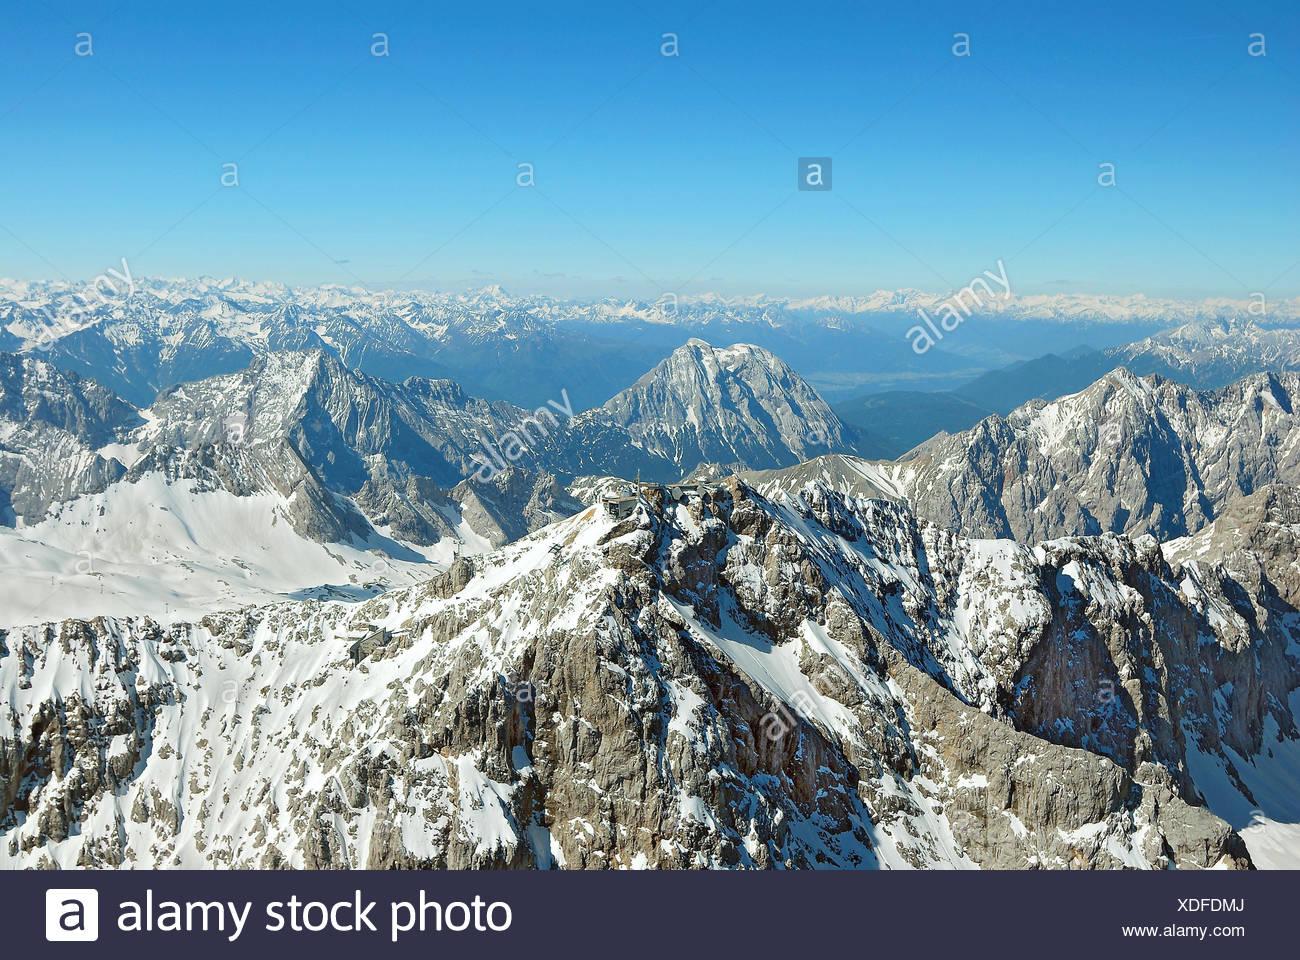 mountains, alps, ski-region, glacier, high mountains, germany, german federal - Stock Image